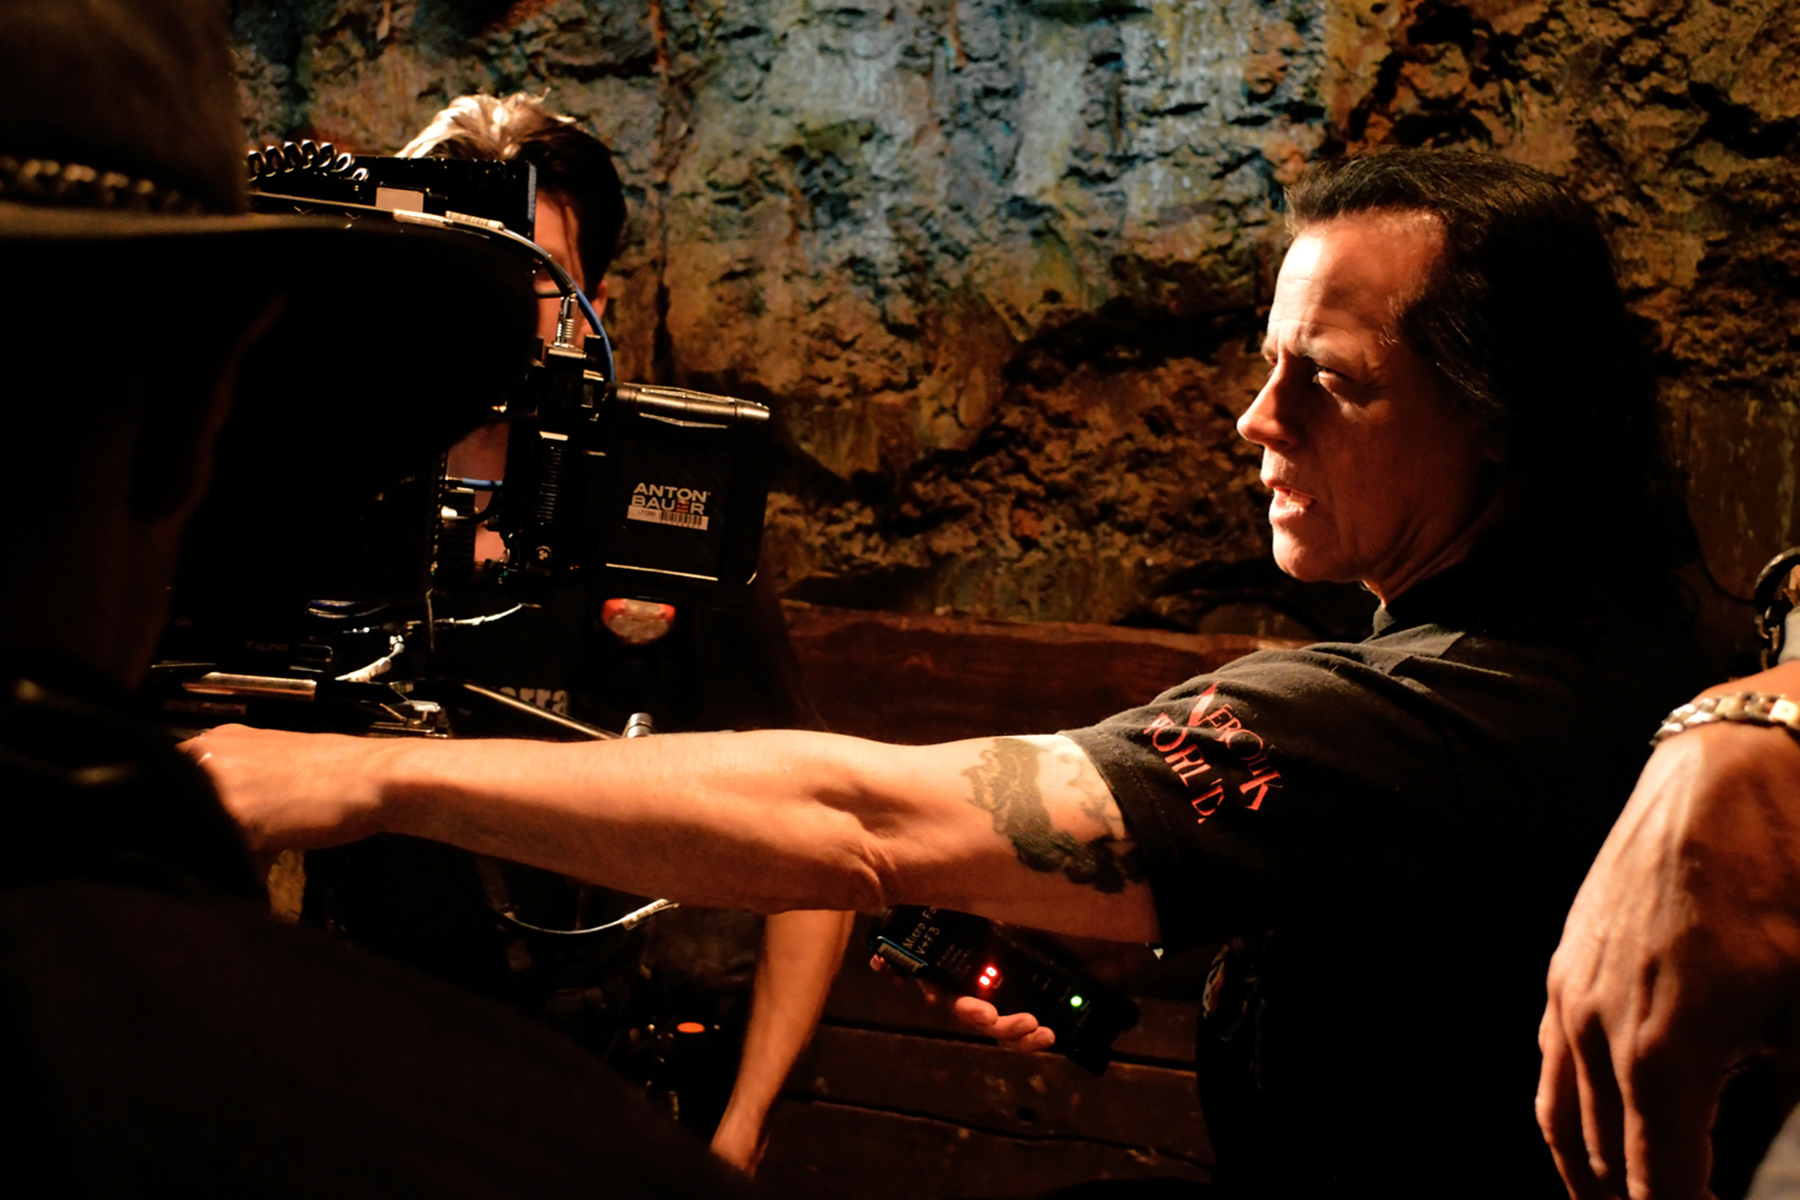 Danzig behind the camera.